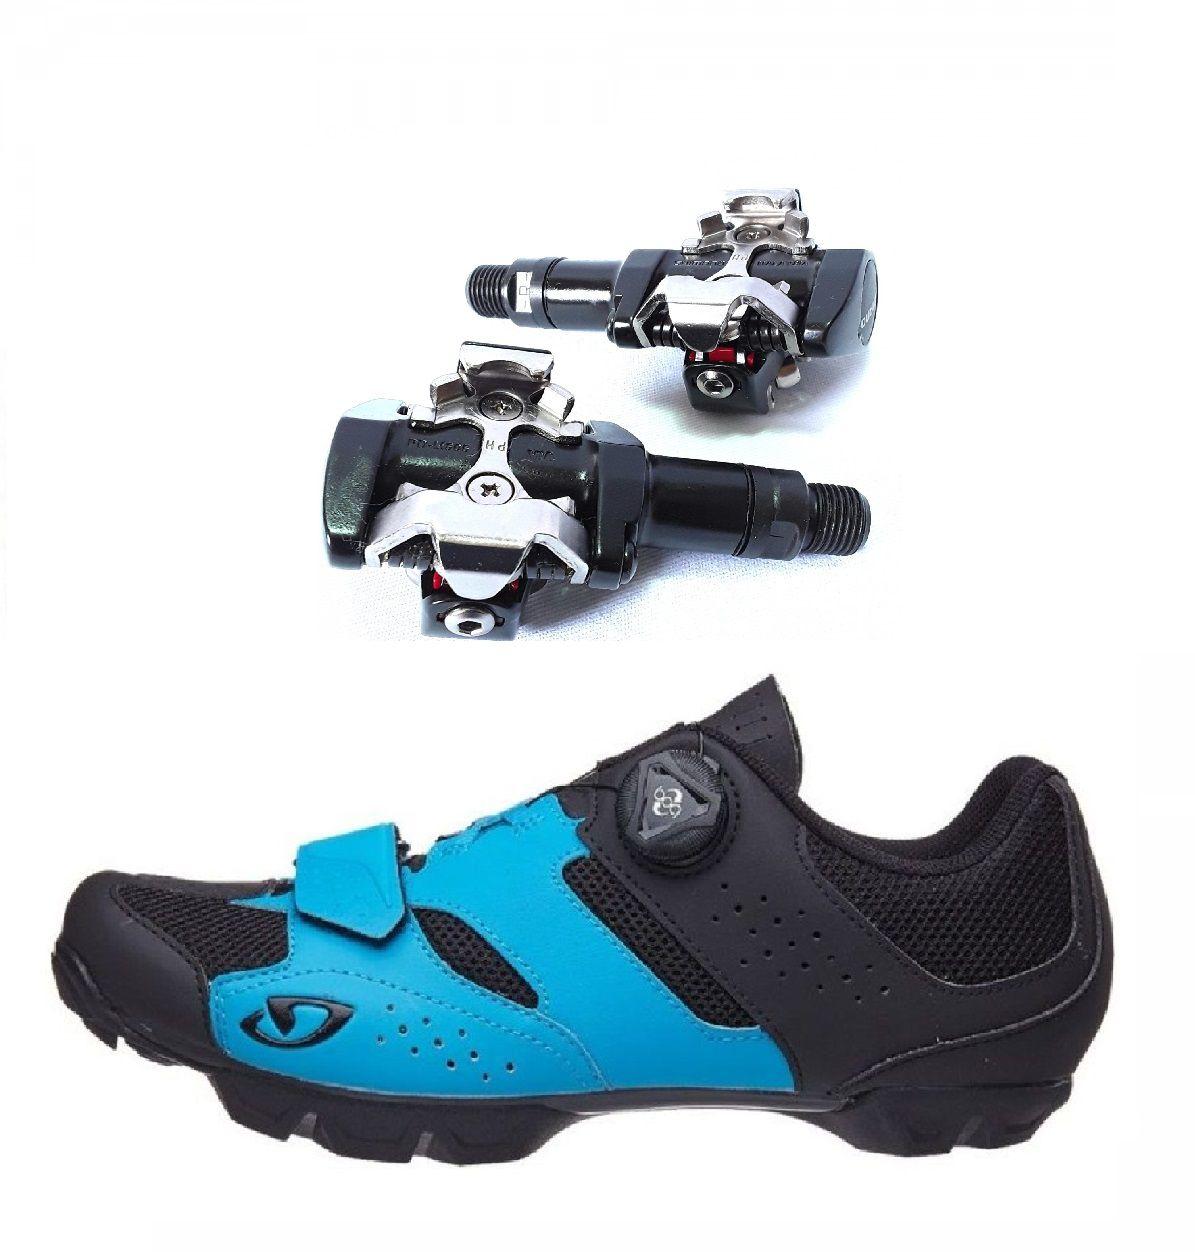 Sapatilha Giro Cylinder Pedal Clip Shimano PD-M505